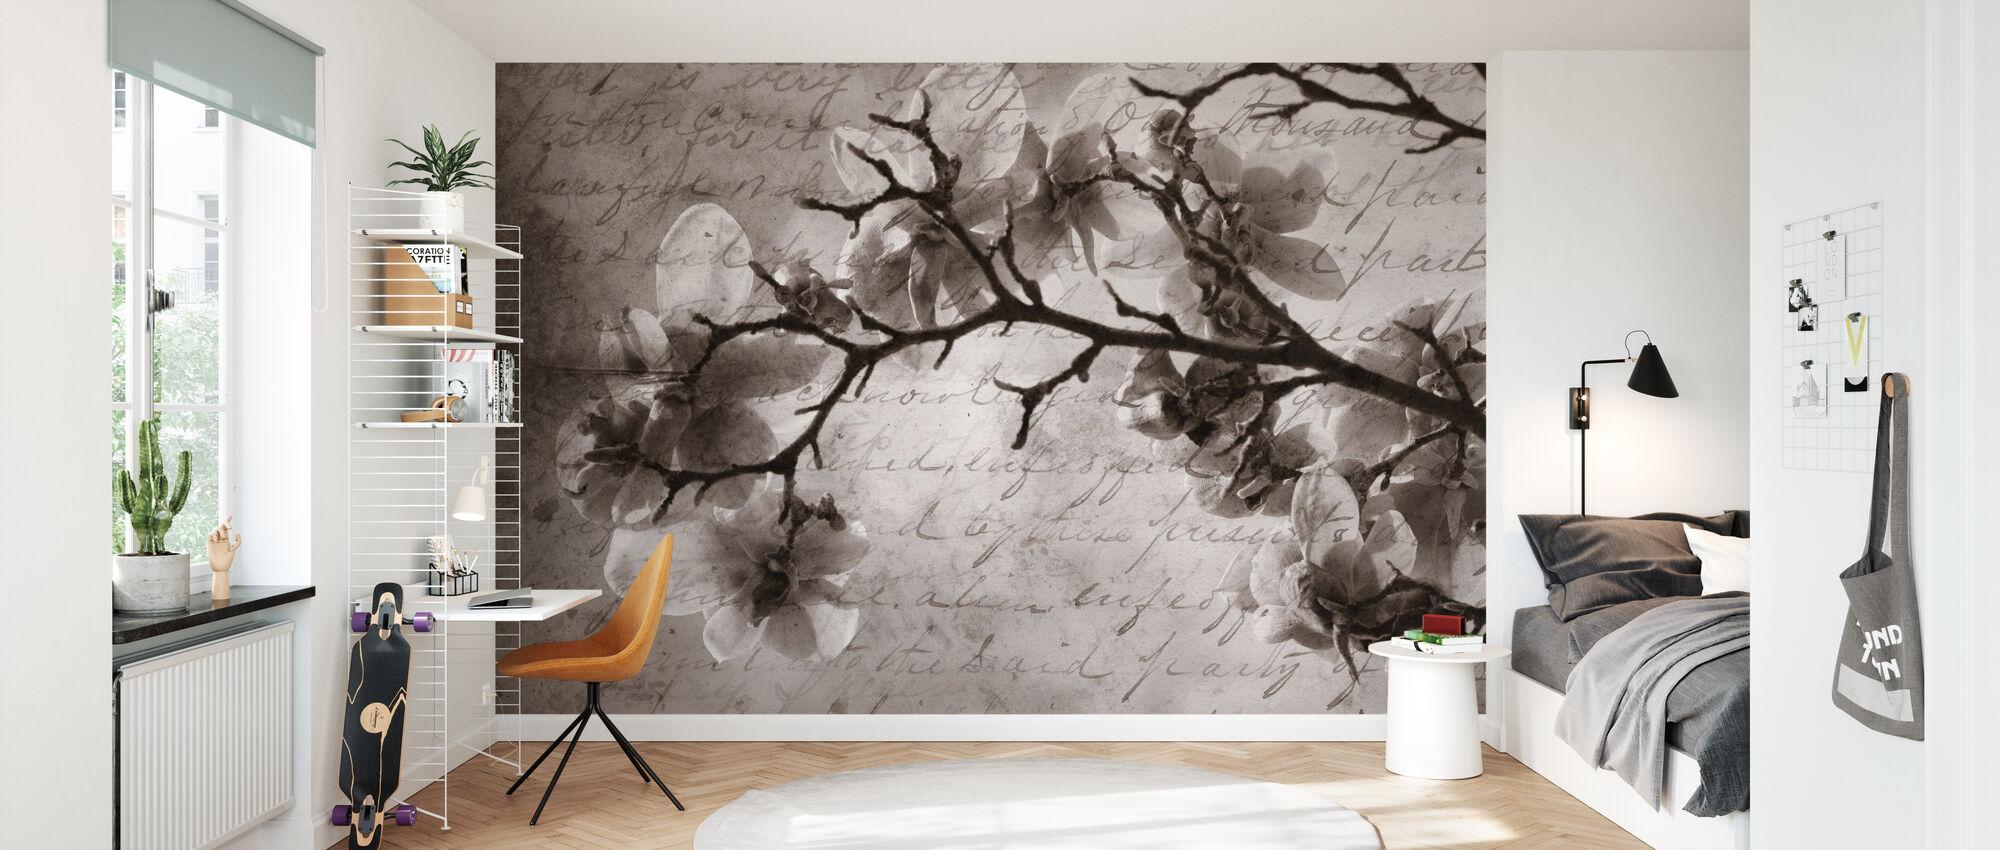 Magnolia minner - Tapet - Barnerom